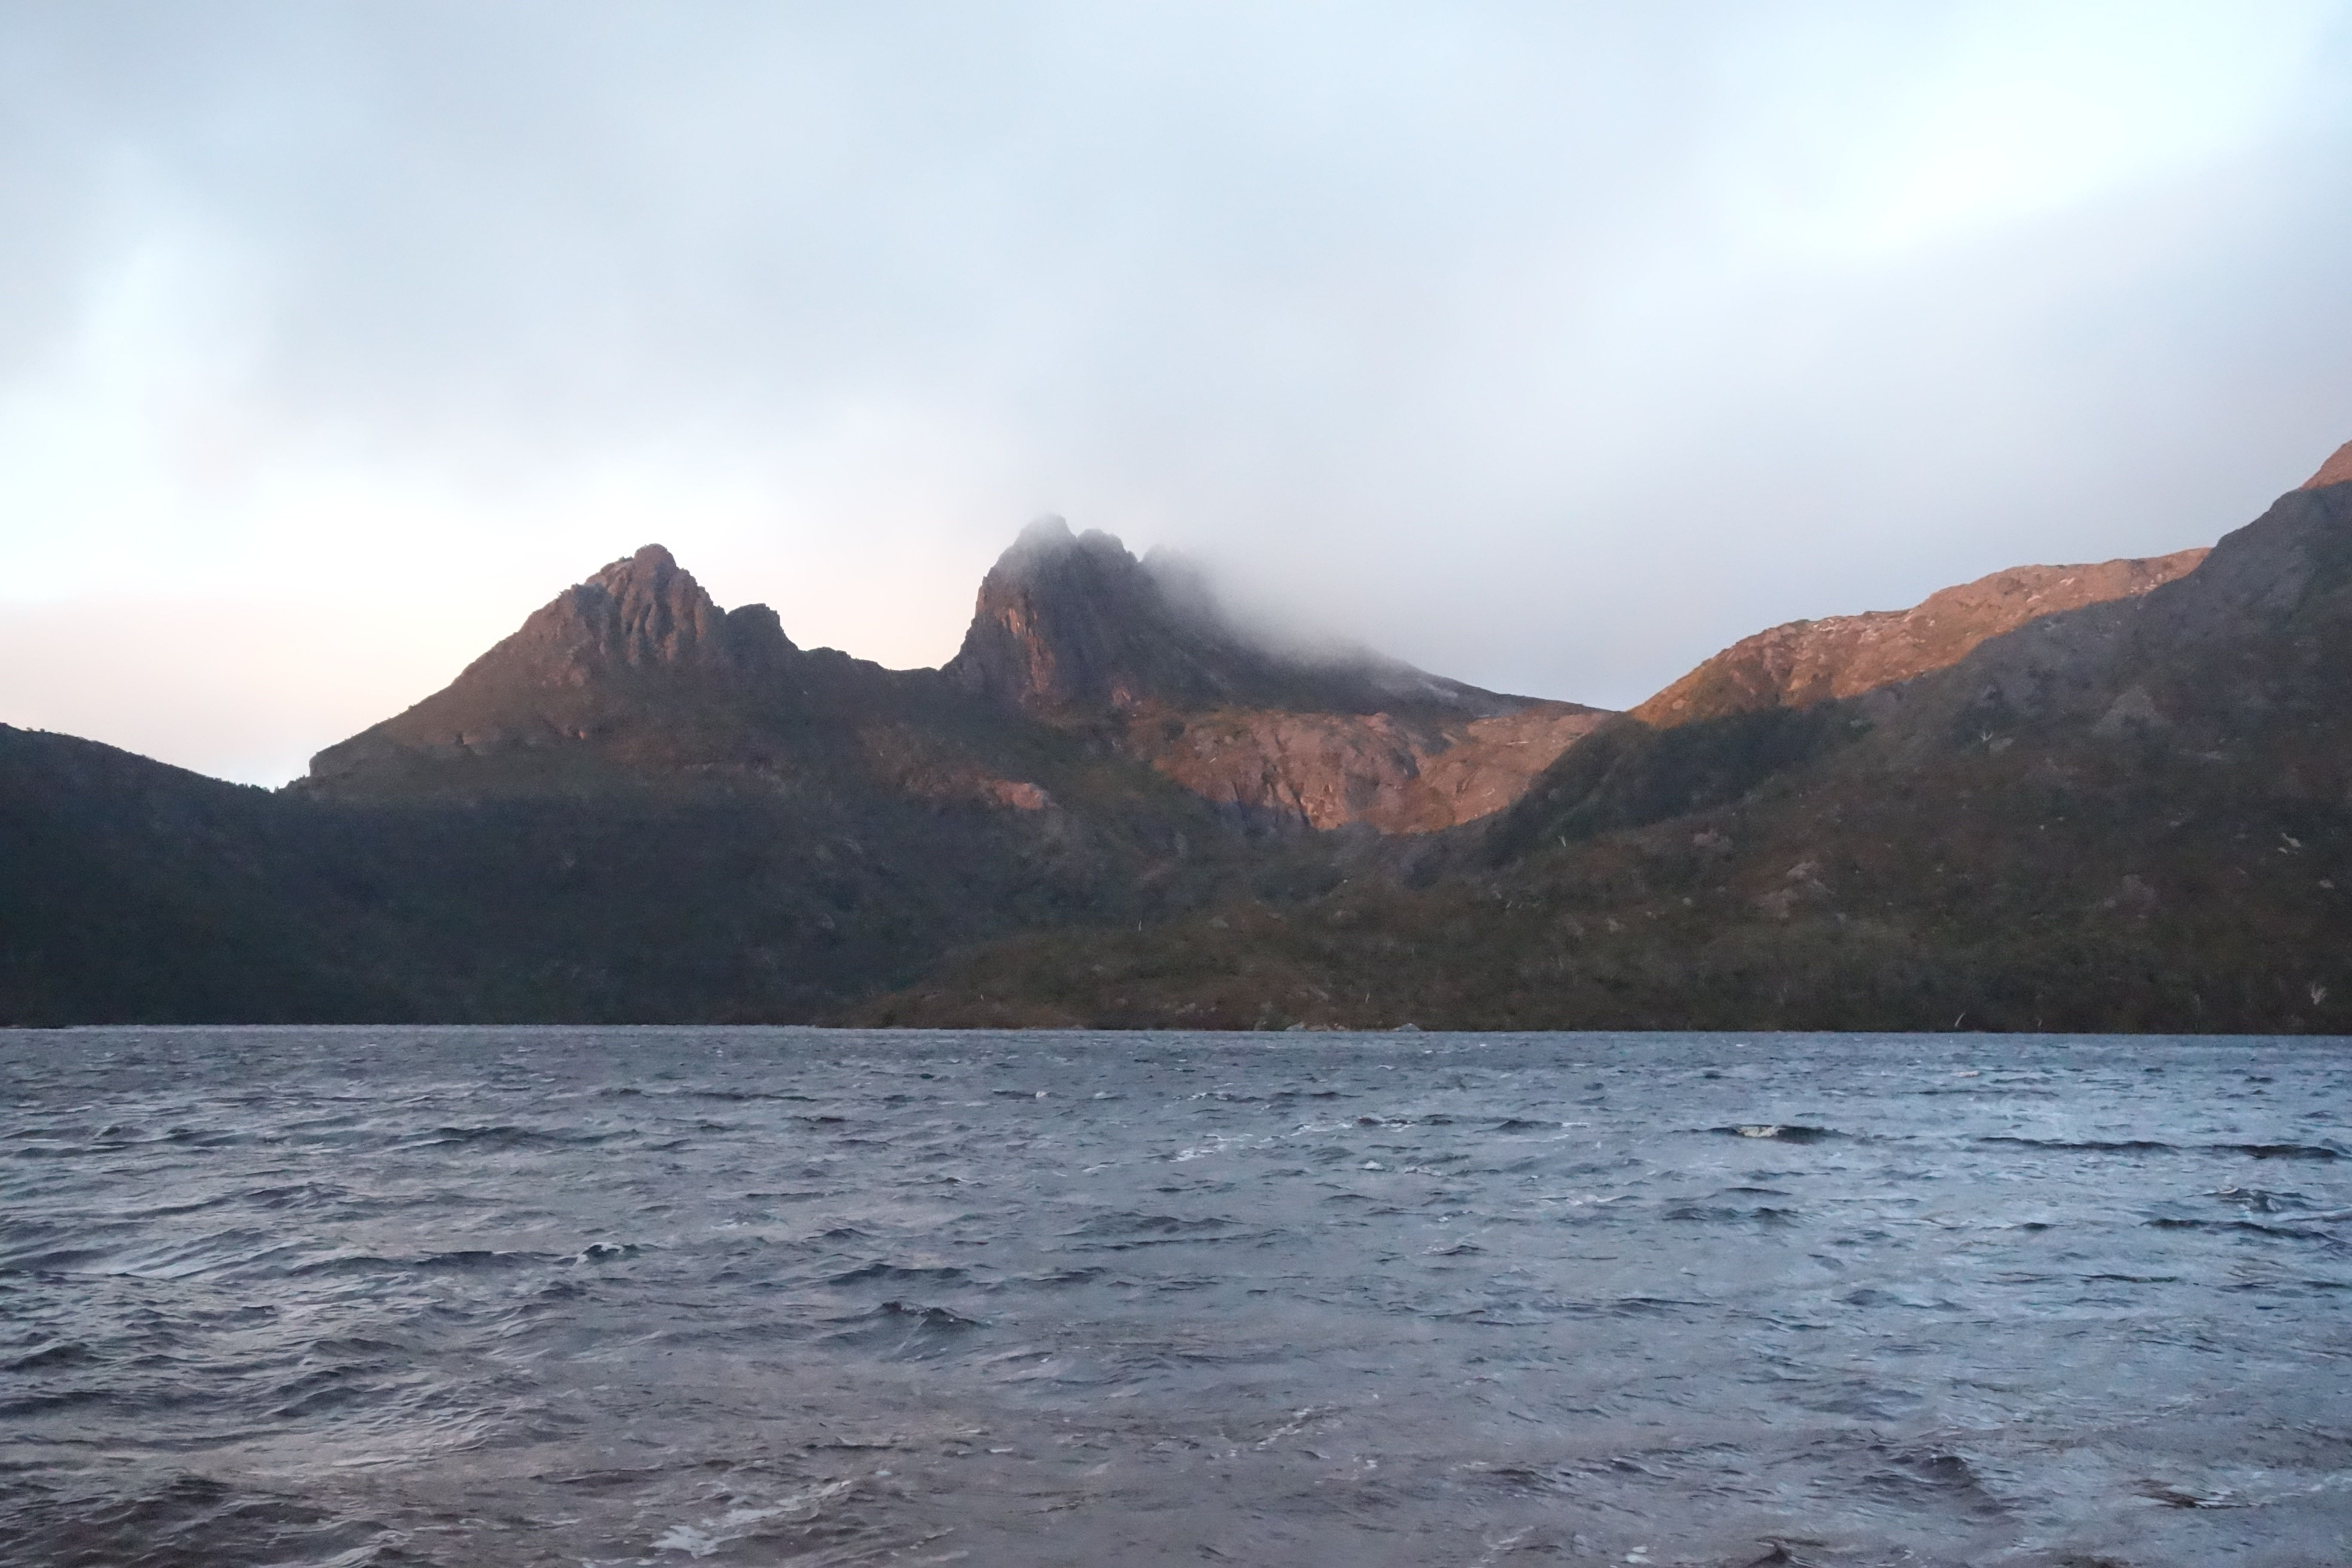 Australie-Tasmanie: Les Cradle Mountain au petit matin.